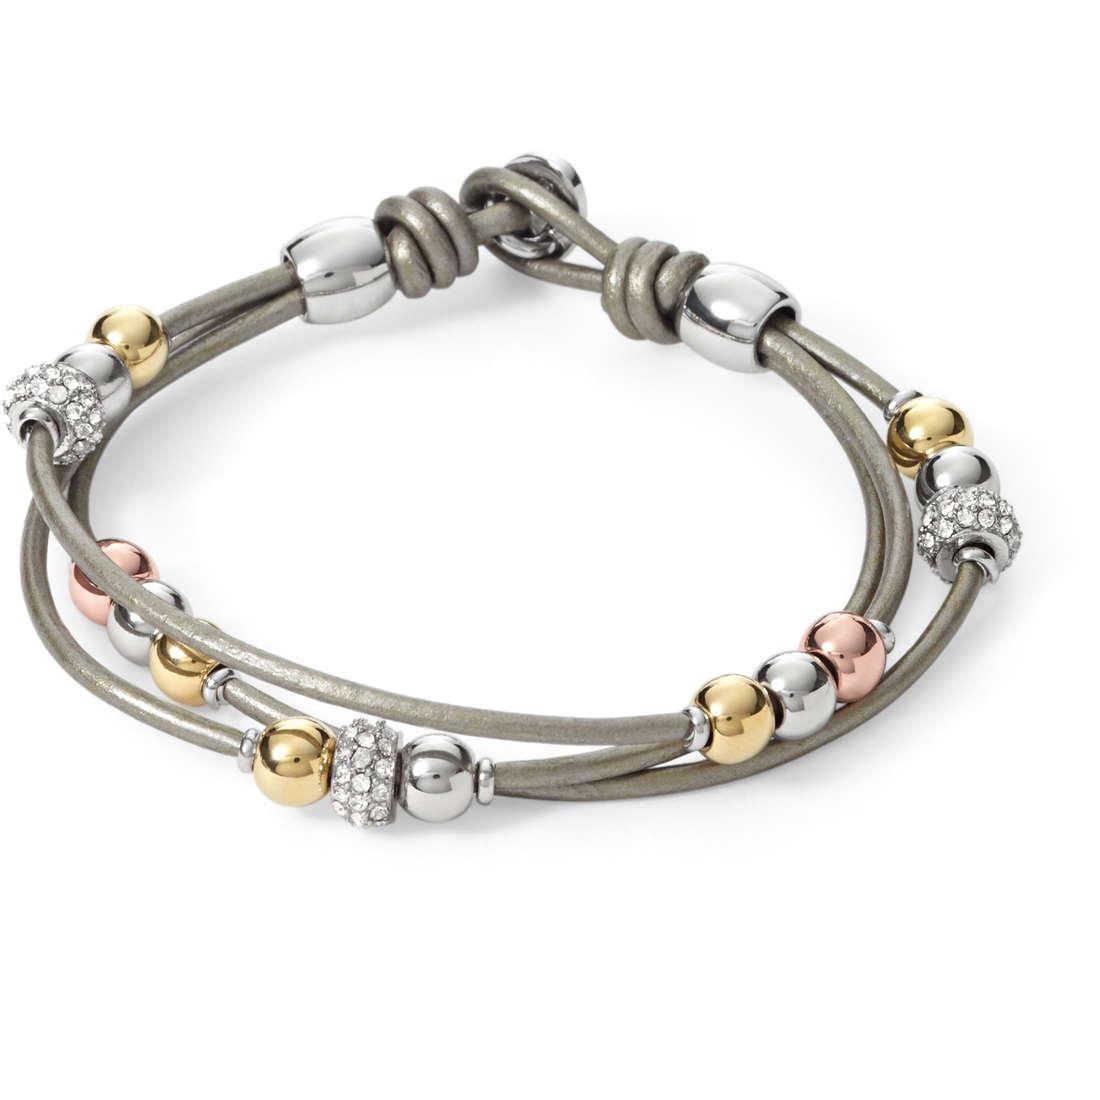 bracelet woman jewellery Fossil Fall 2013 JA6067998